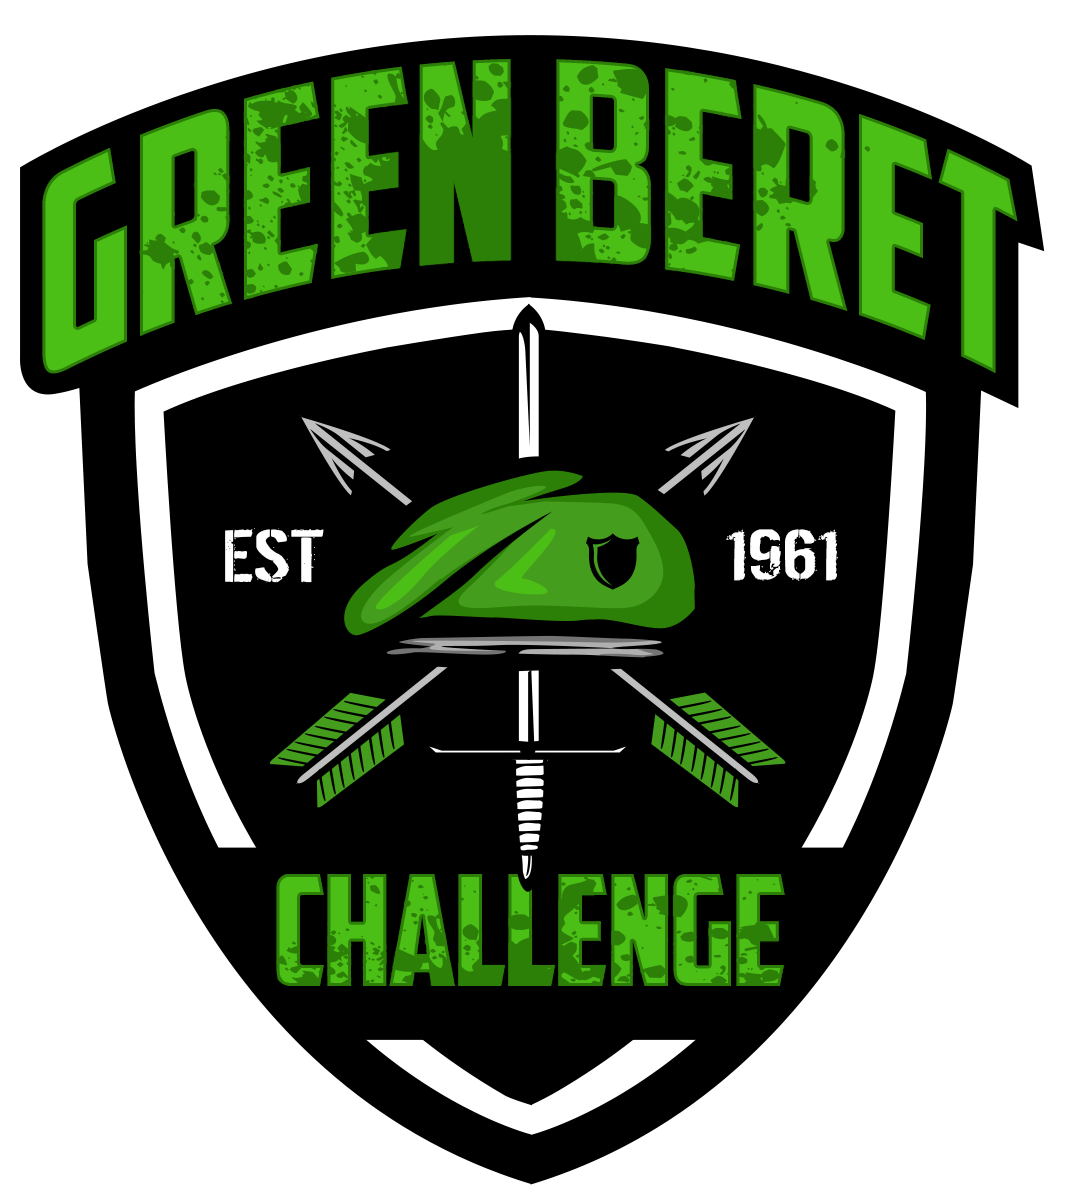 green-beret-challenge-championship-sponsor